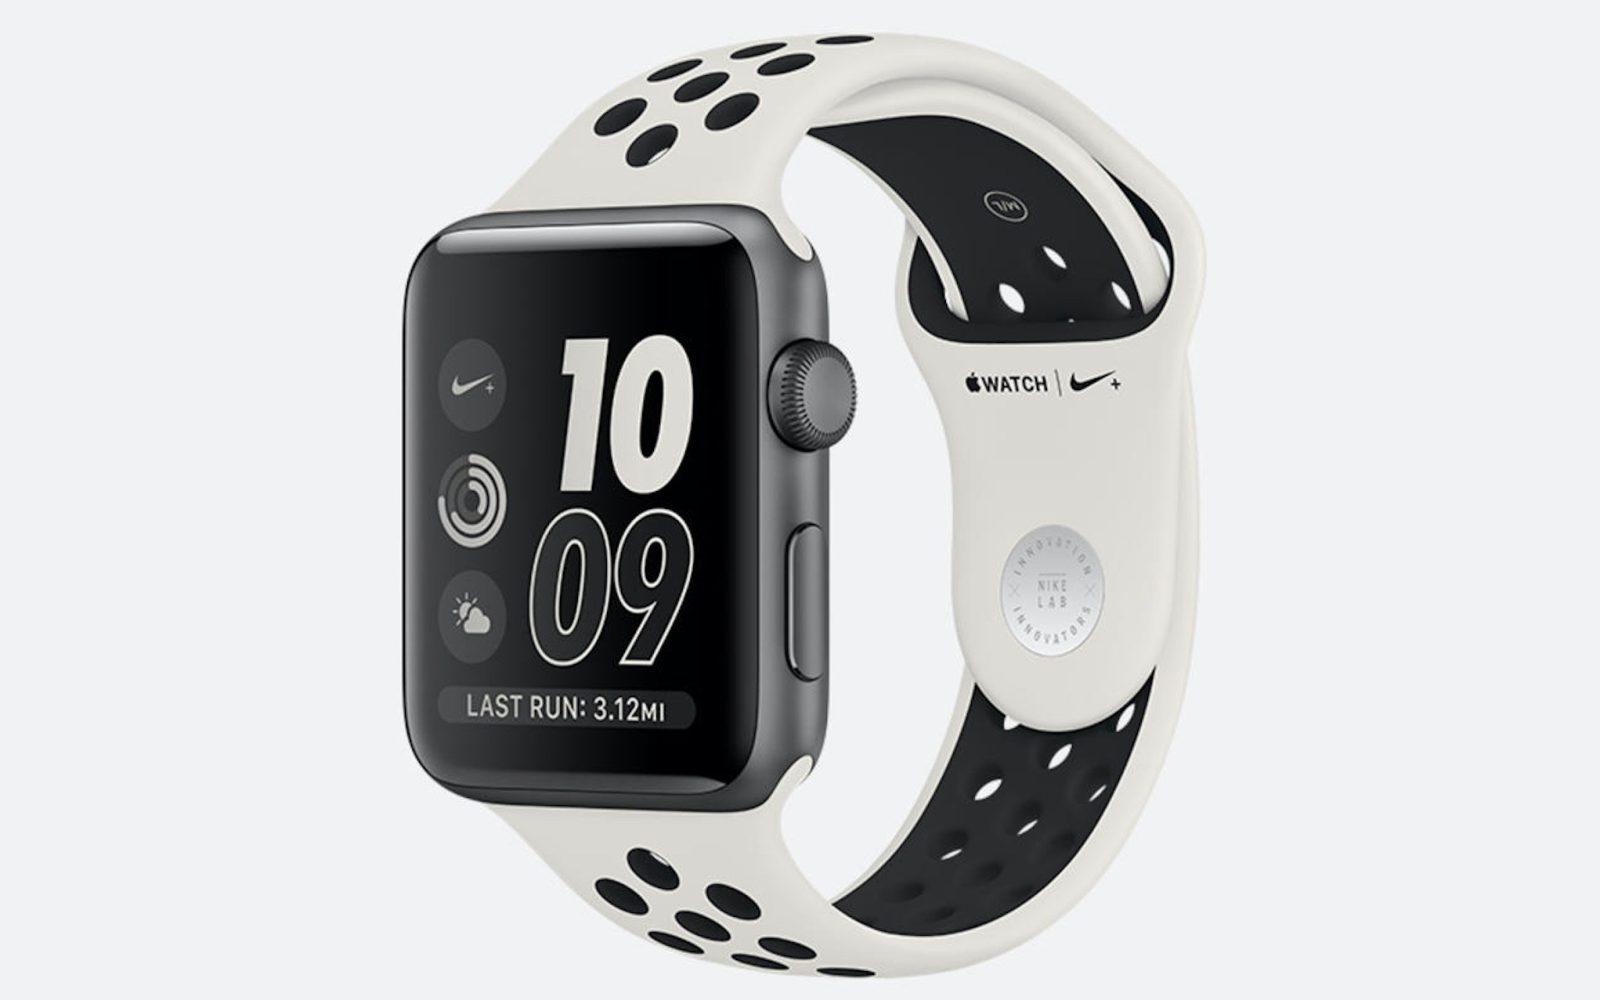 2cc52504f7a49 Nike launching new Apple Watch NikeLab style with Light Bone Black band